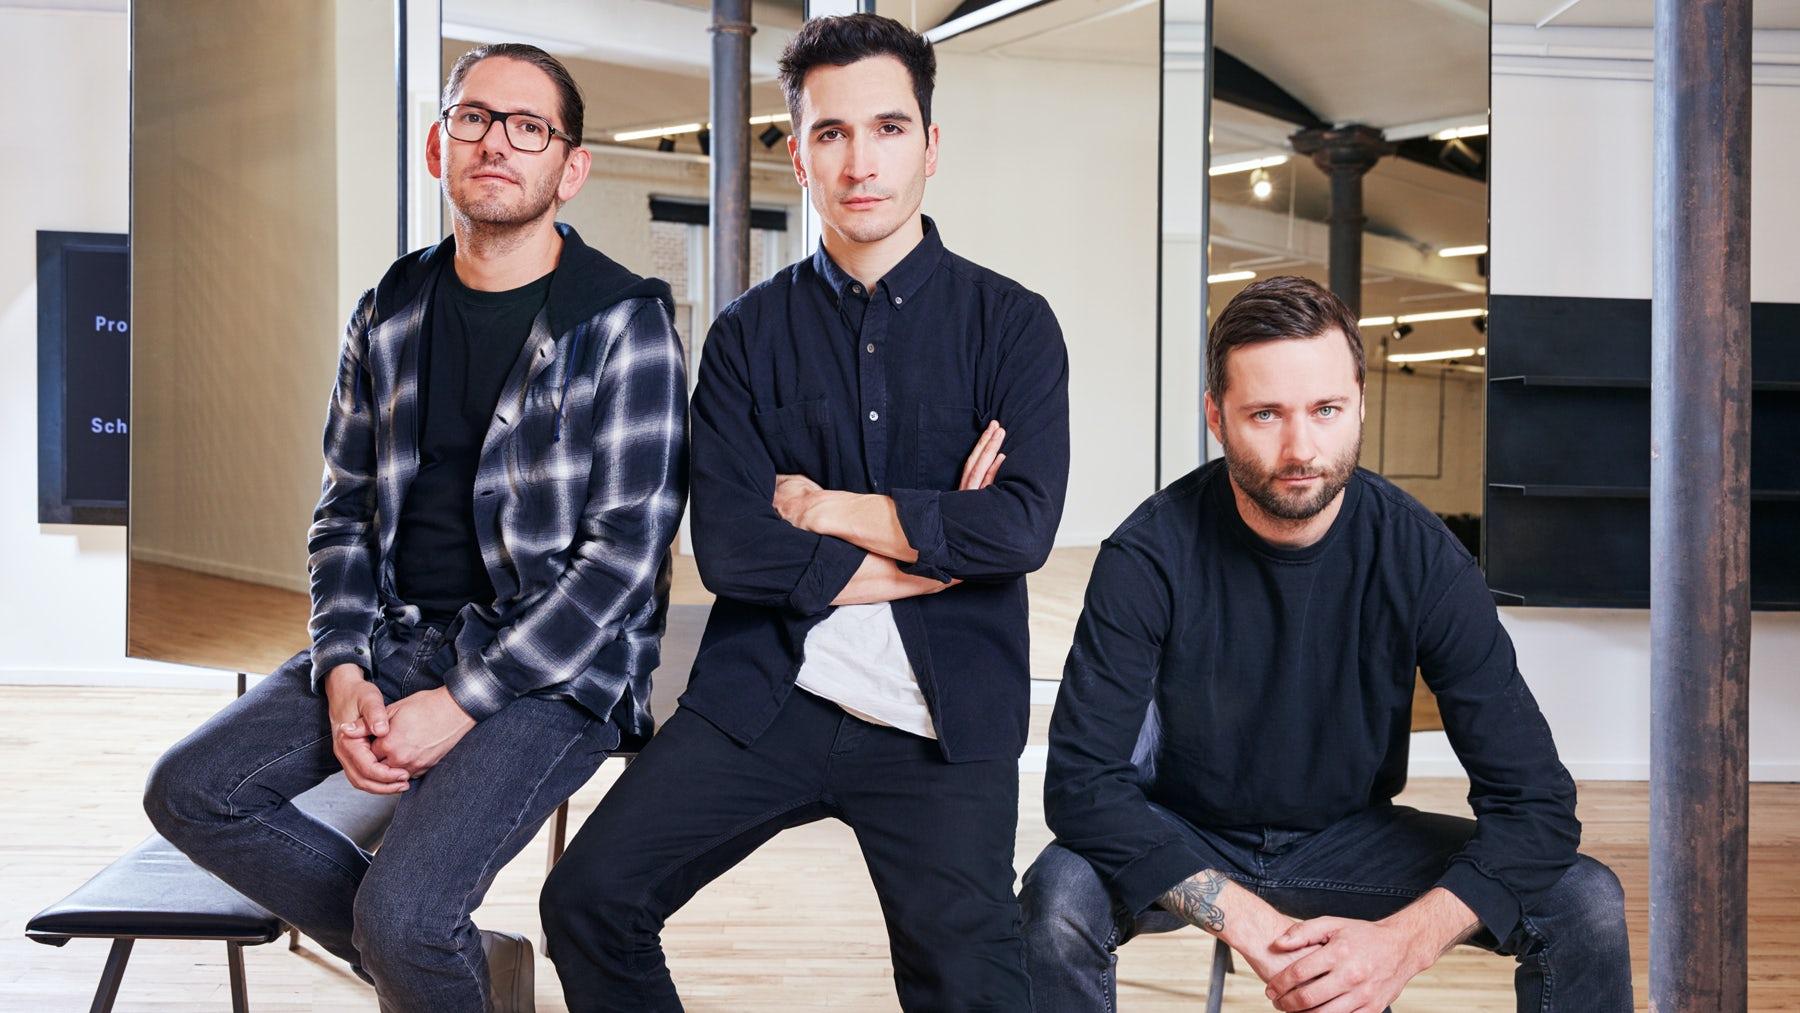 Proenza Schouler CEO Judd Crane, designers Lazaro Hernandez and Jack McCollough | Photo: Kevin Trageser